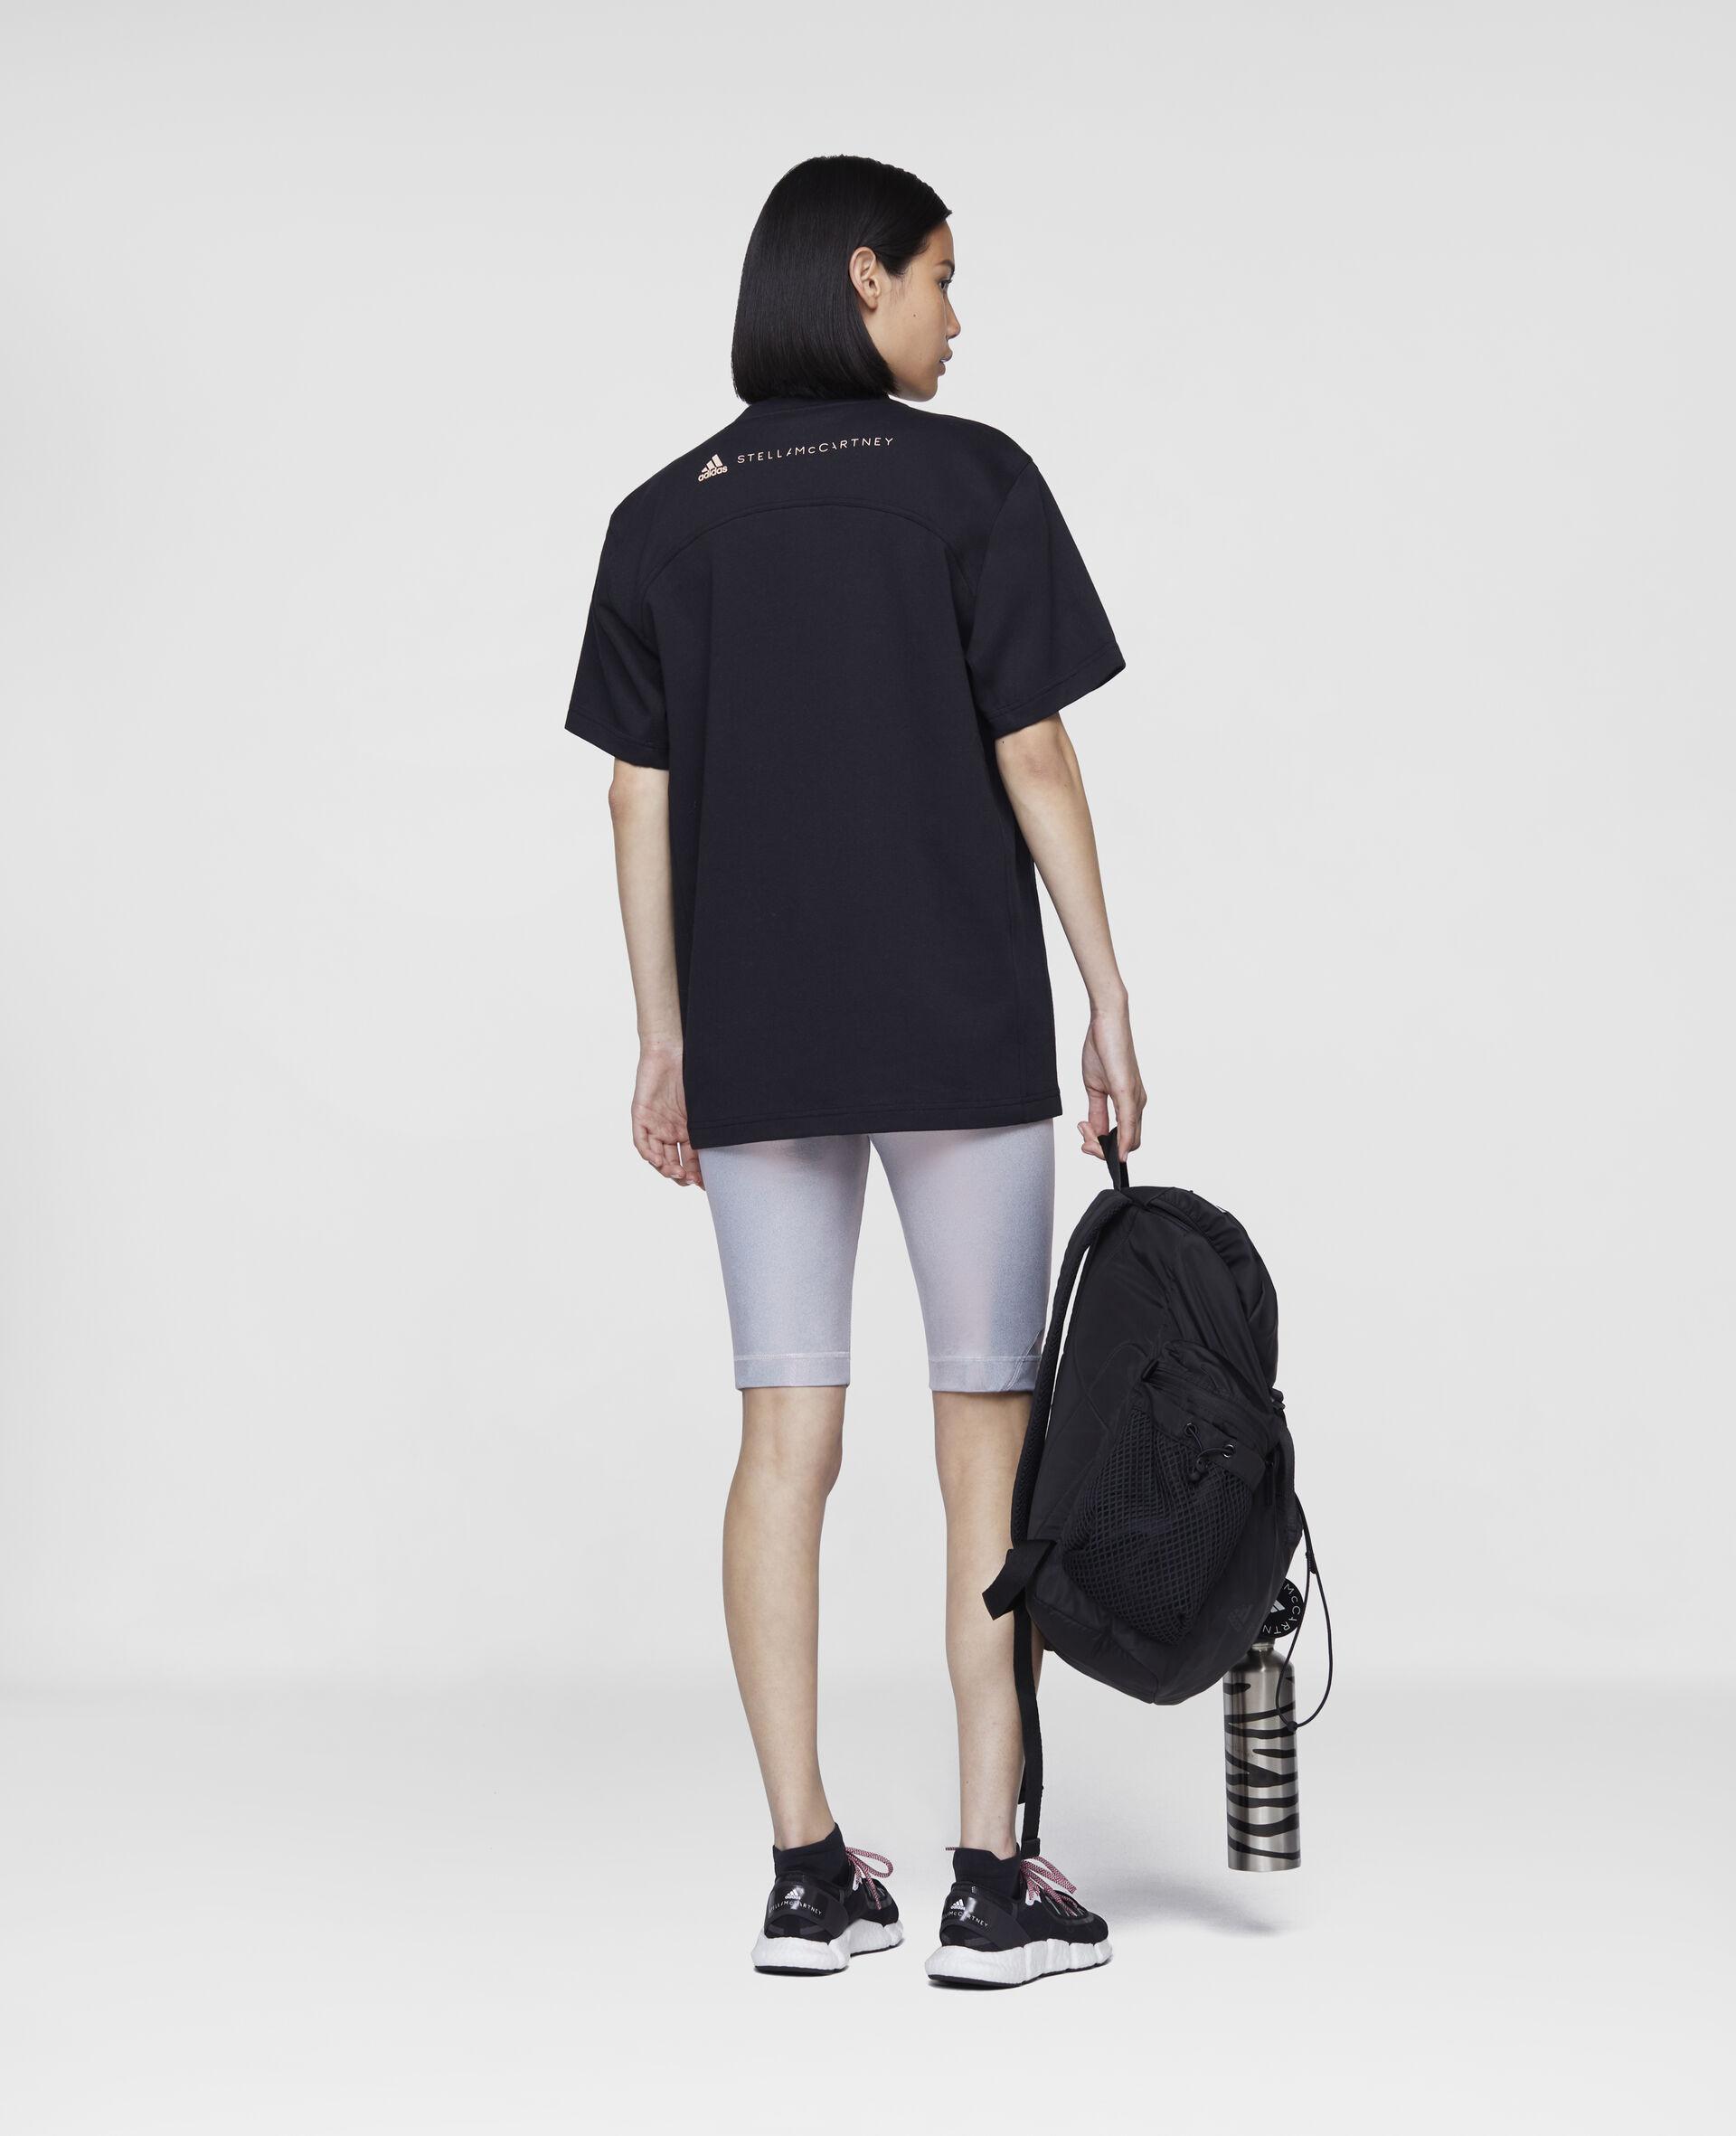 Black Training T-Shirt-Black-large image number 2